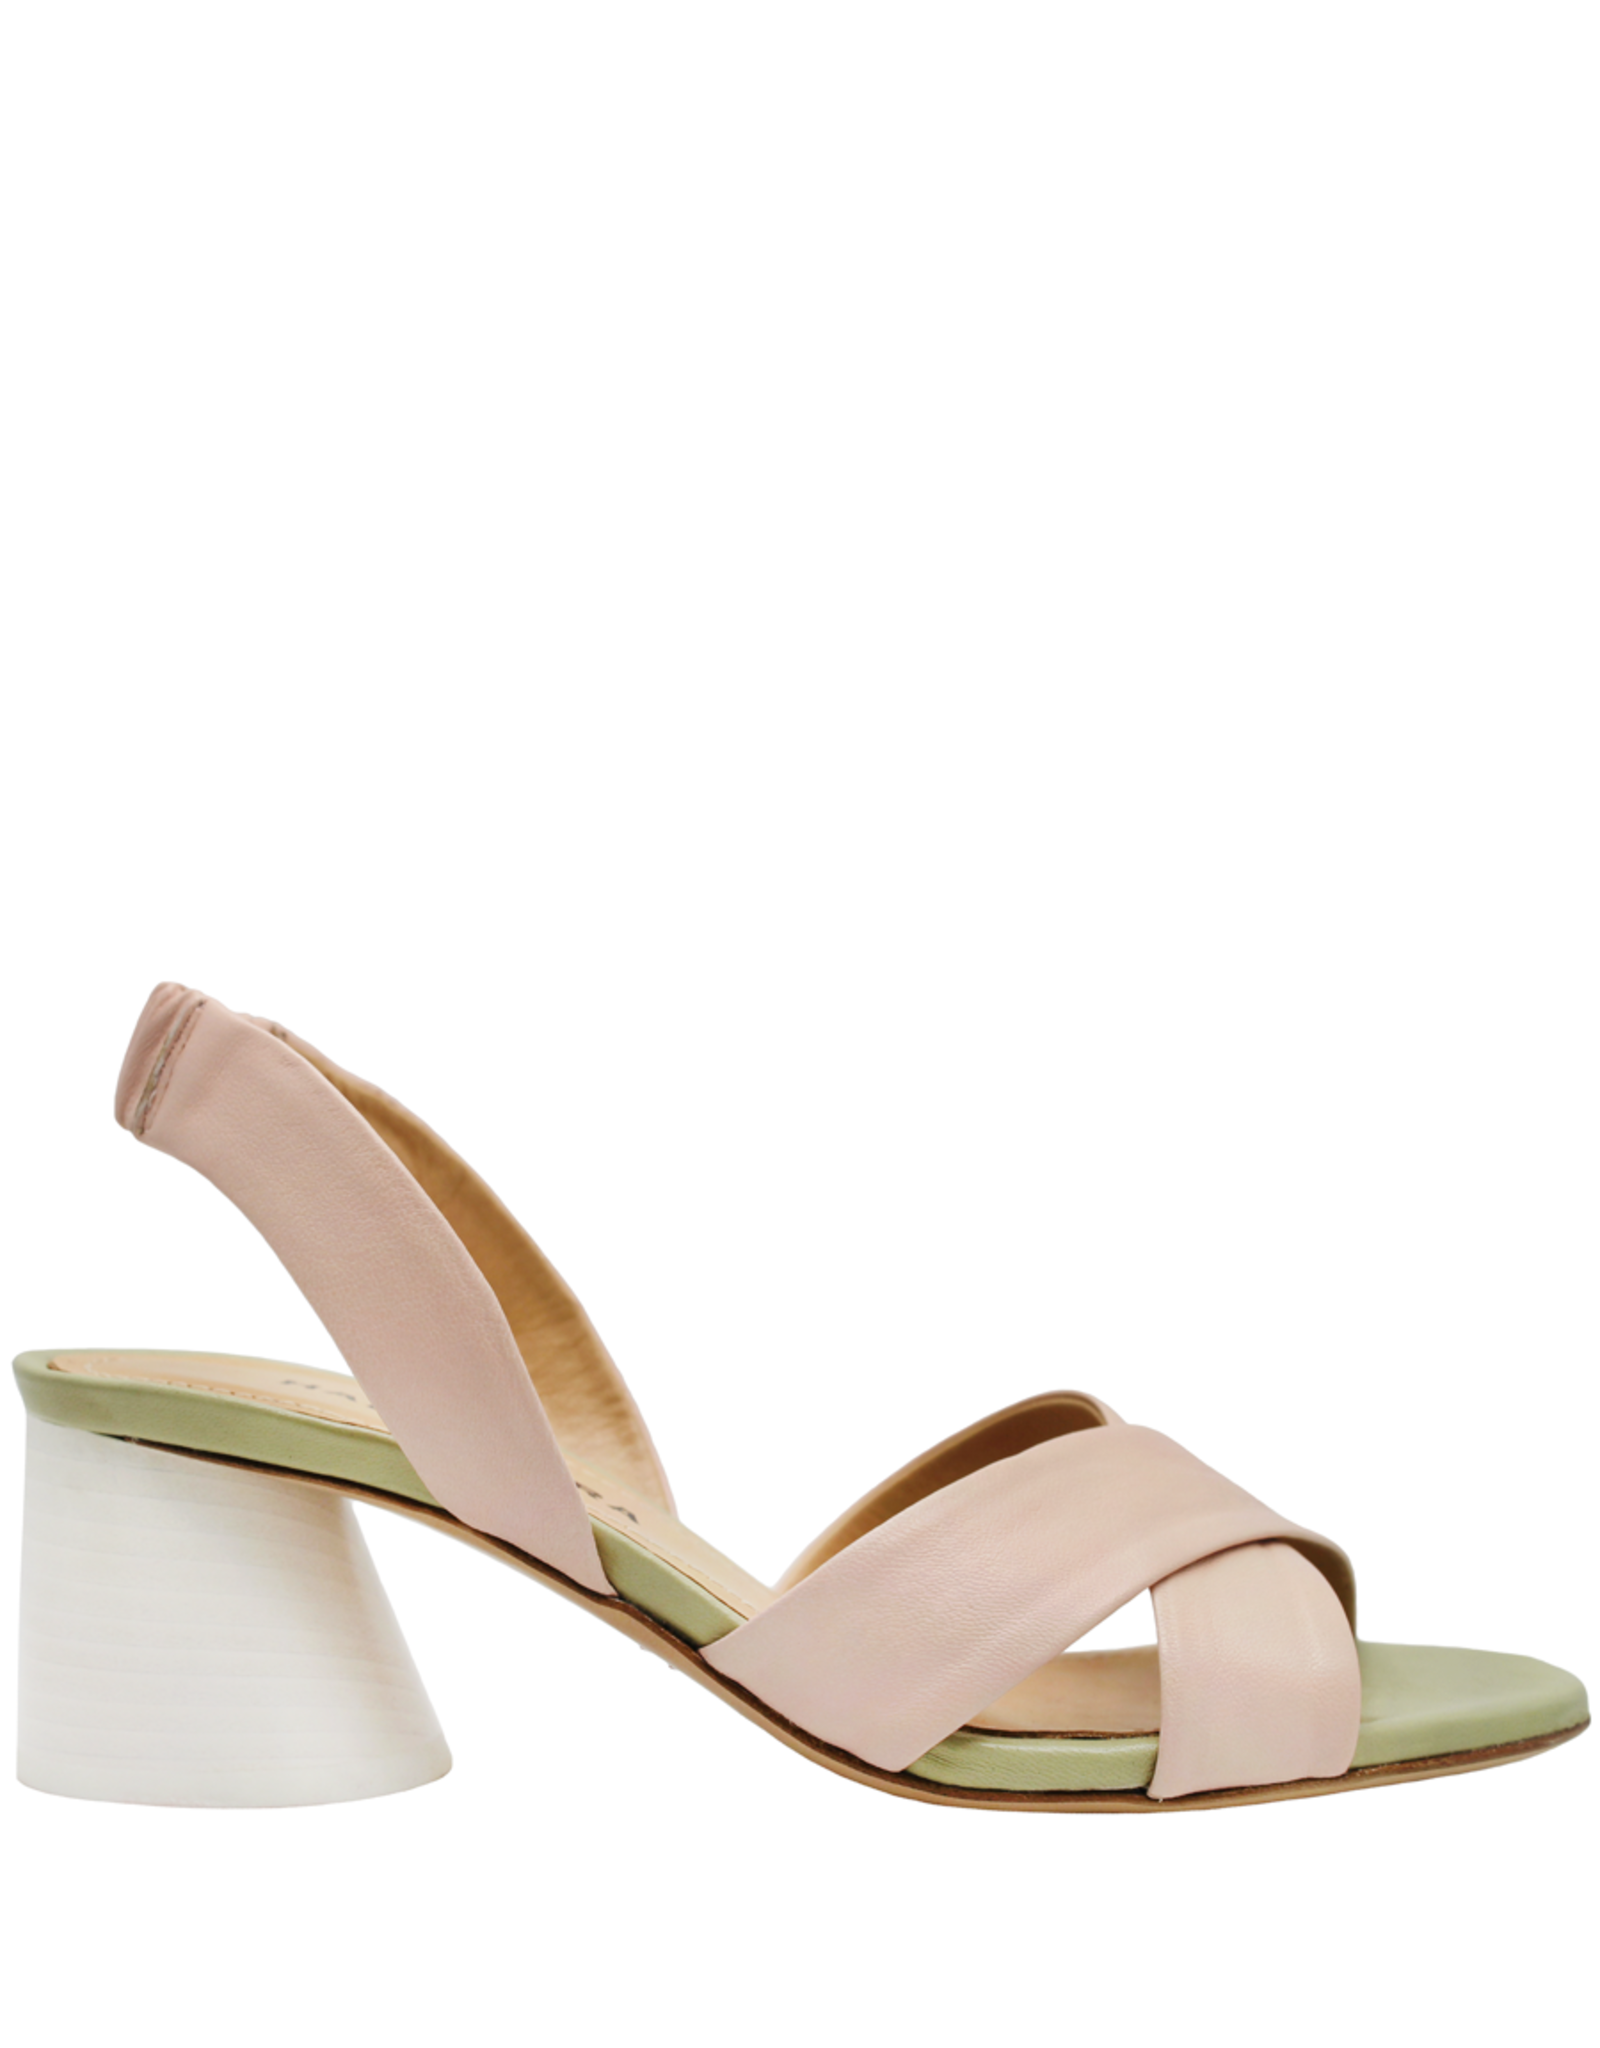 Halmanera Halmanera Peony Criss Cross Sandal White Heel 2015